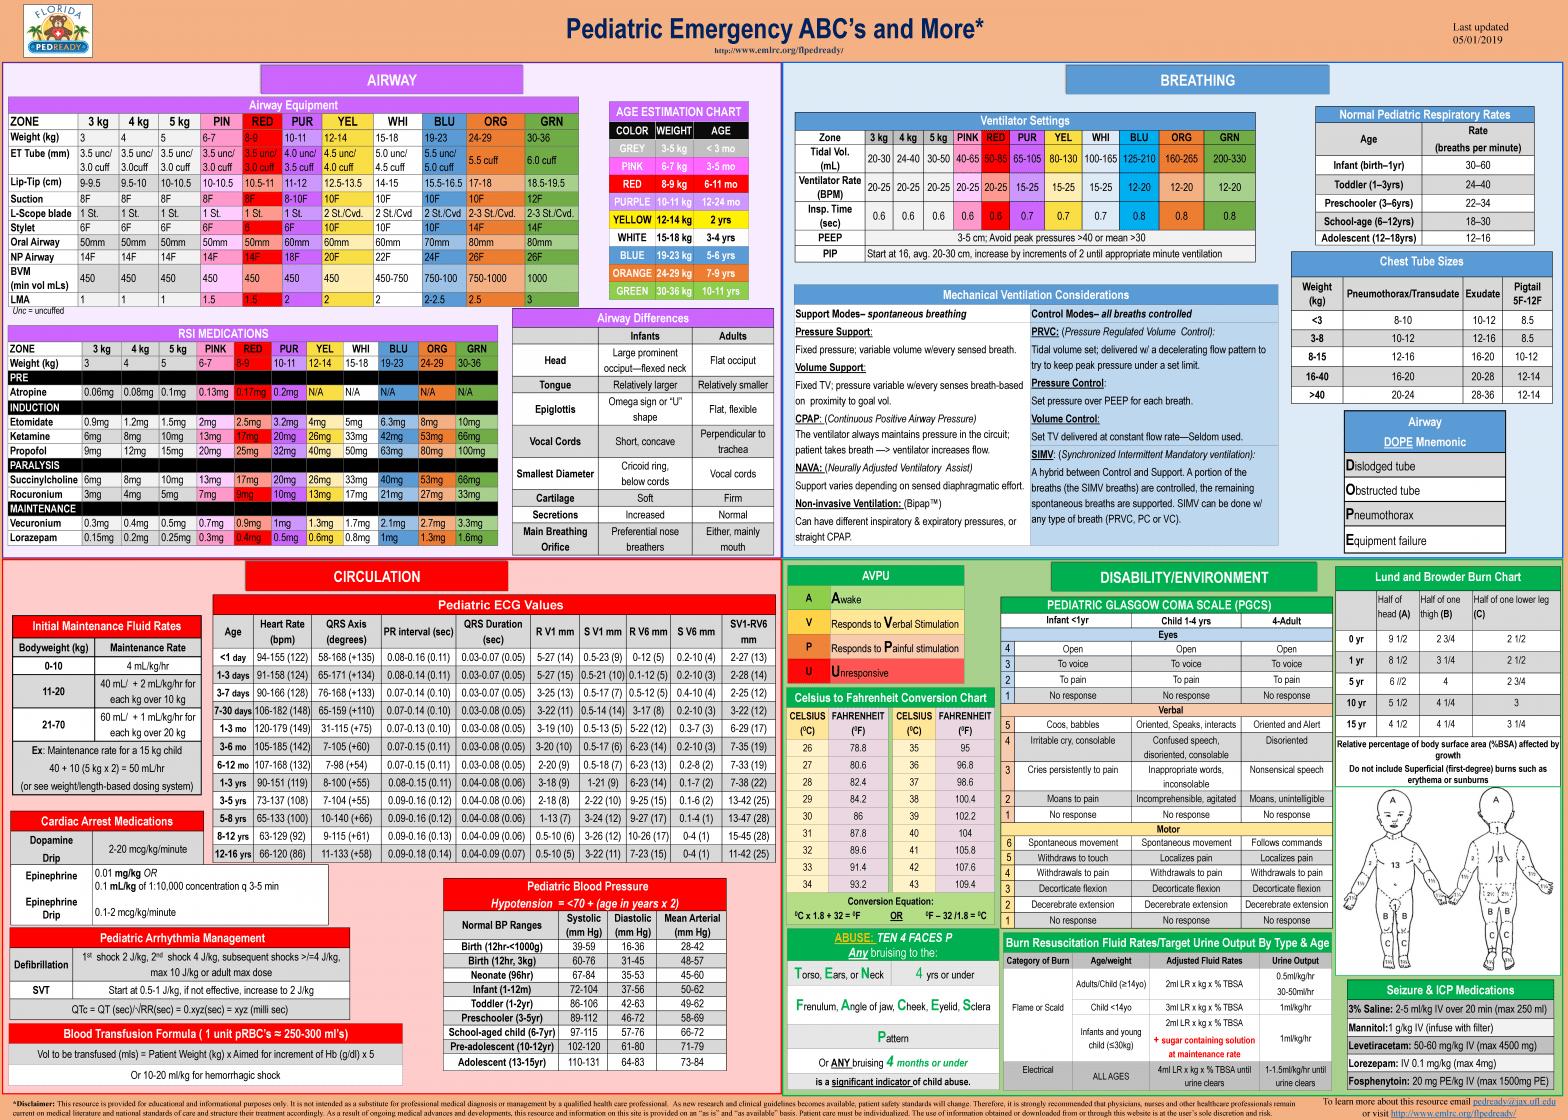 Pediatric Emergency ABCs poster